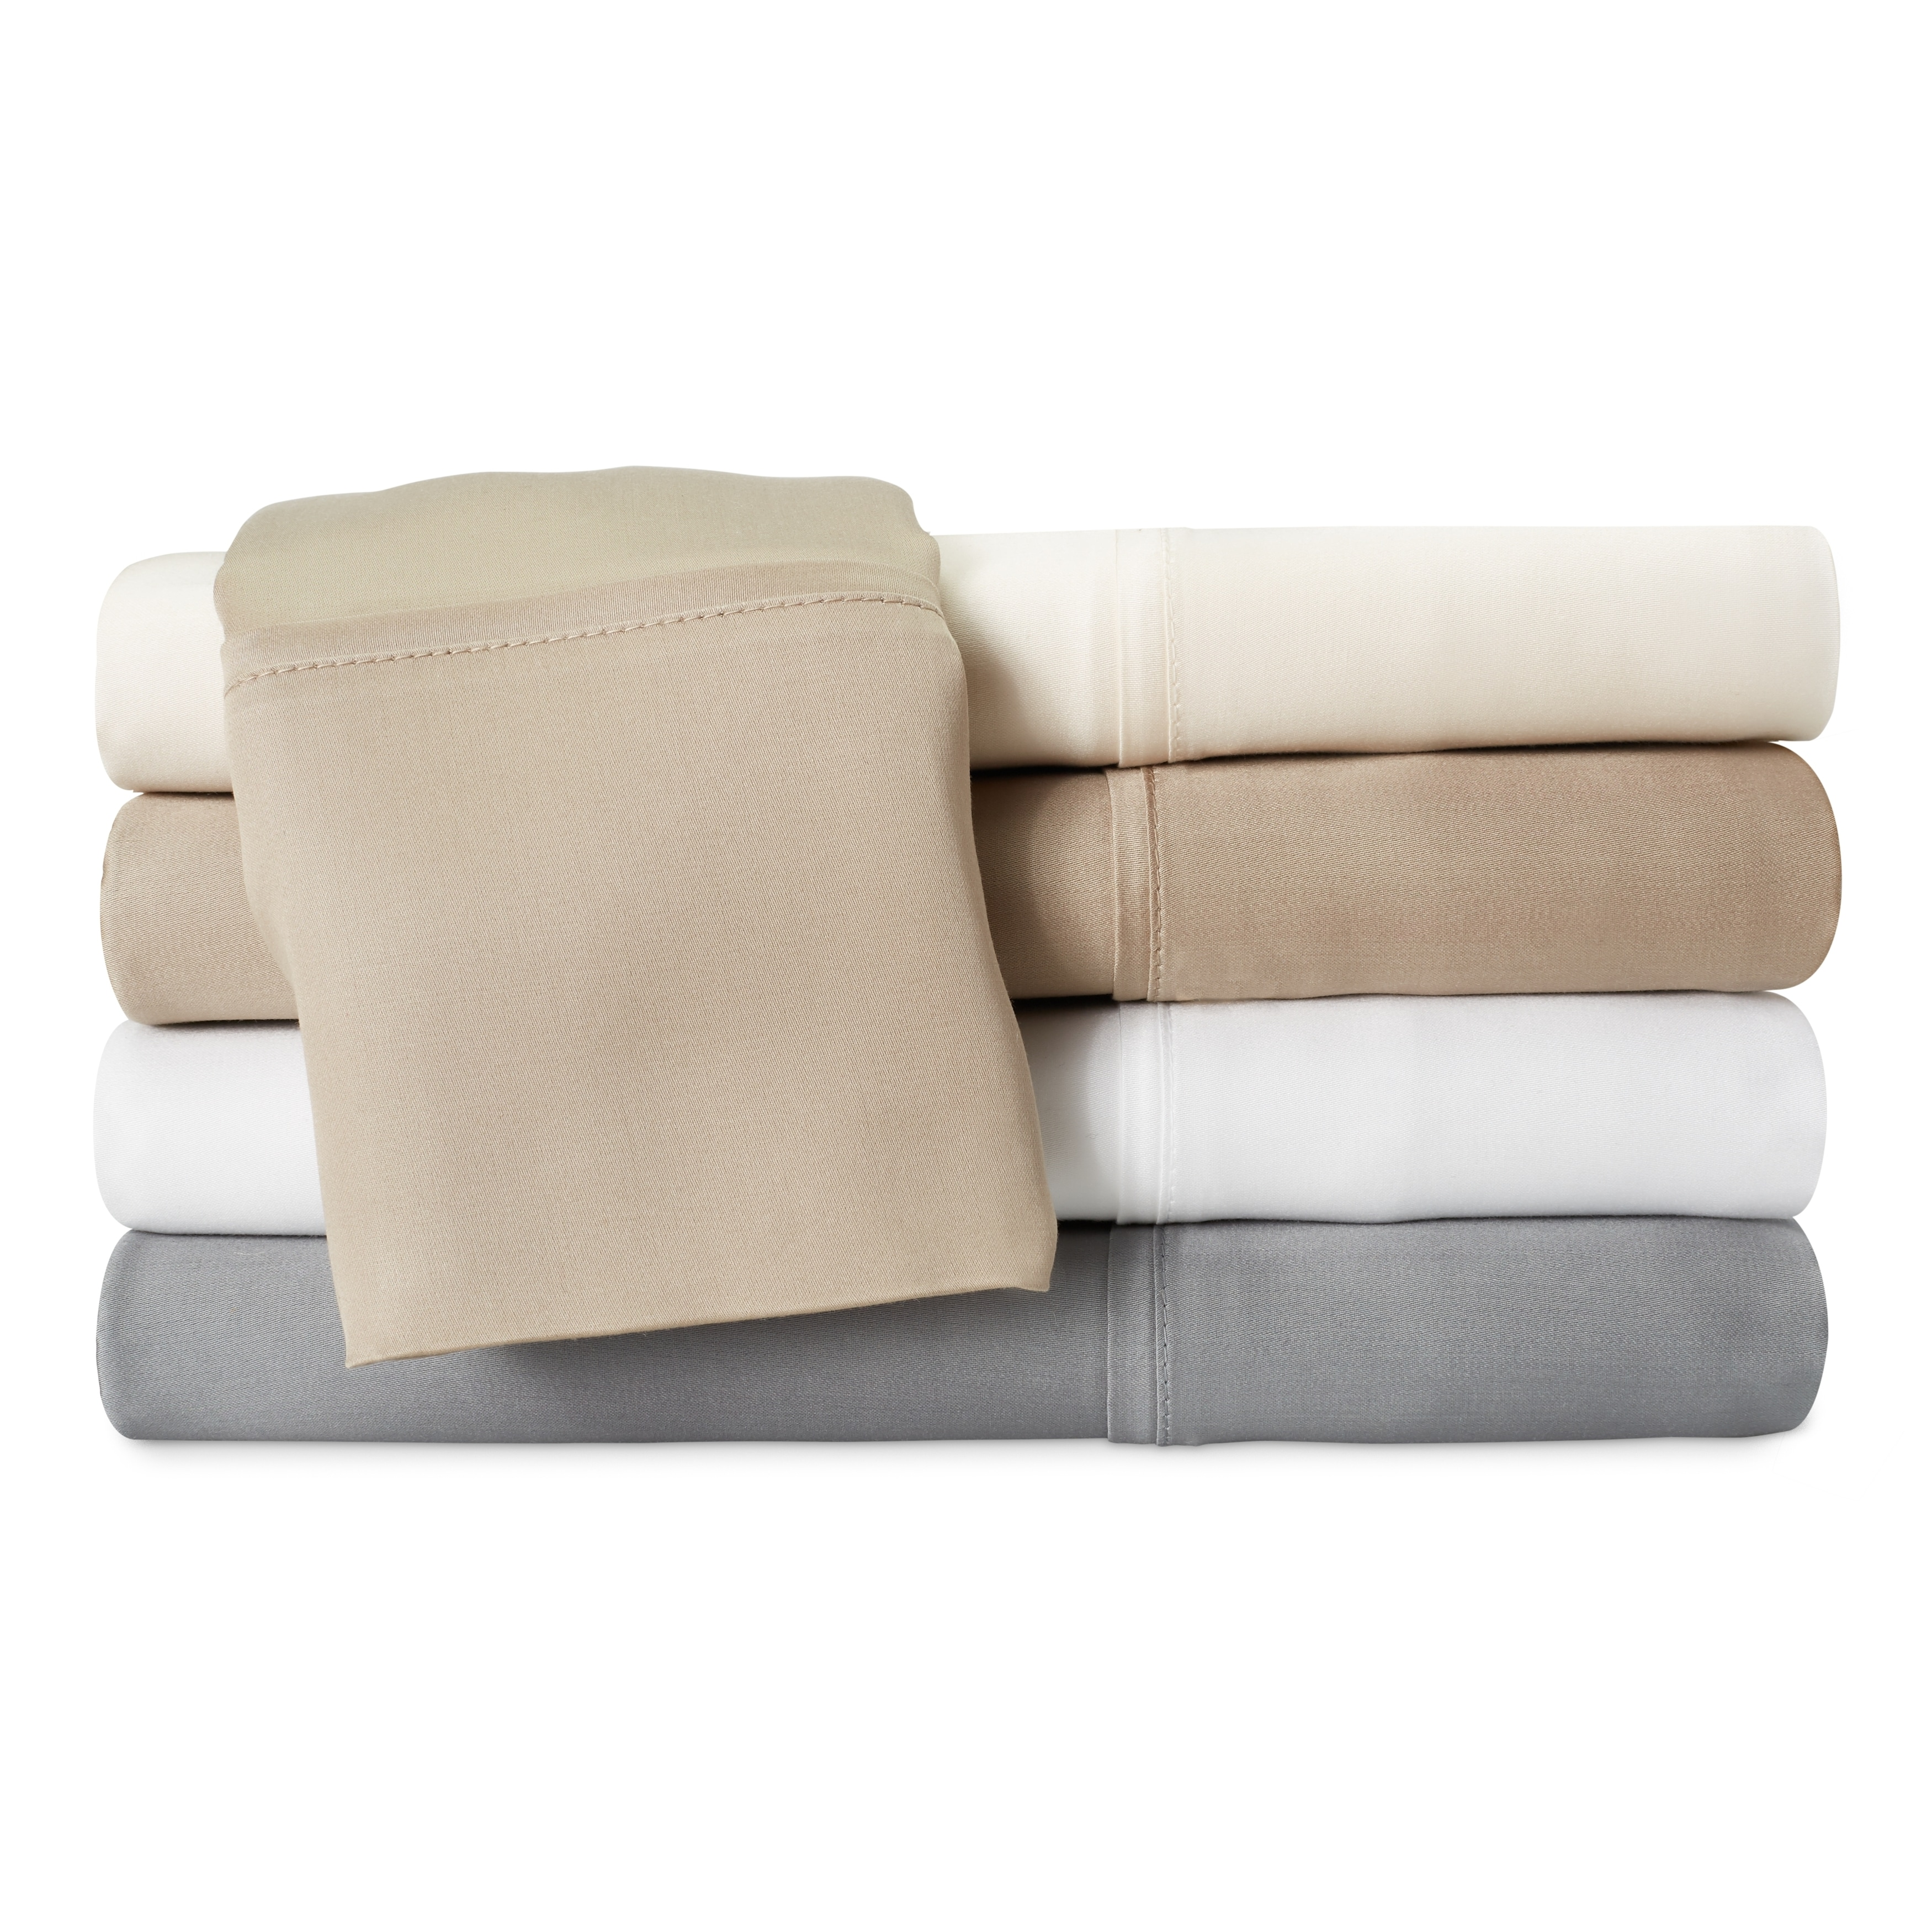 n for bath sheets hot bamboo sleeper best bed australia sleepers